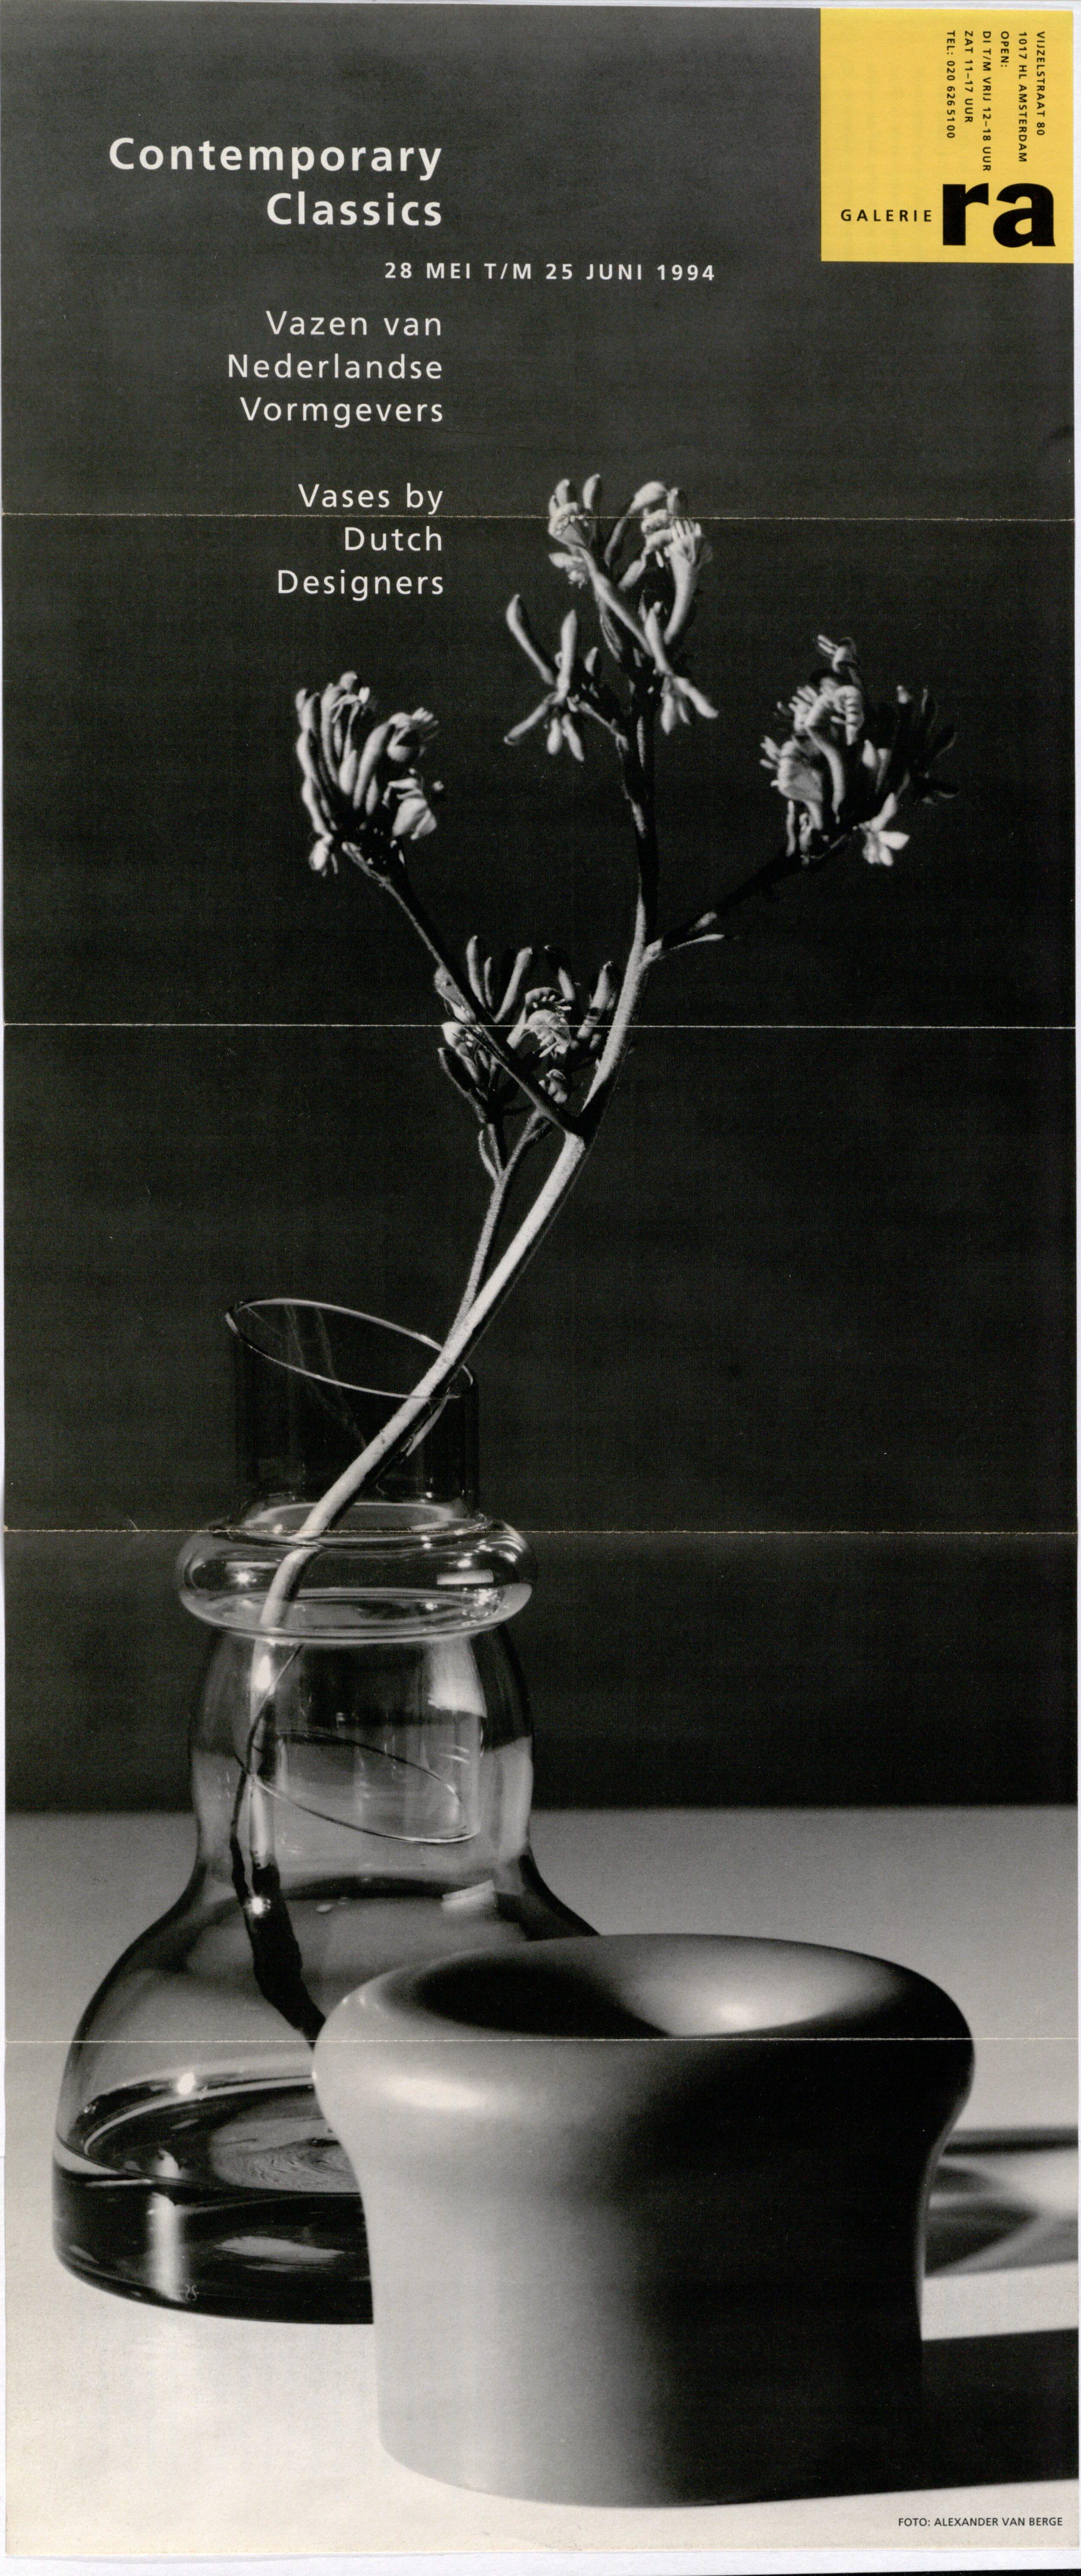 Ra Bulletin 83, mei 1994, voorzijde met foto van Alexander van Berge met vazen van Richard Meitner en Maria van Kesteren, drukwerk, papier. glas, keramiek